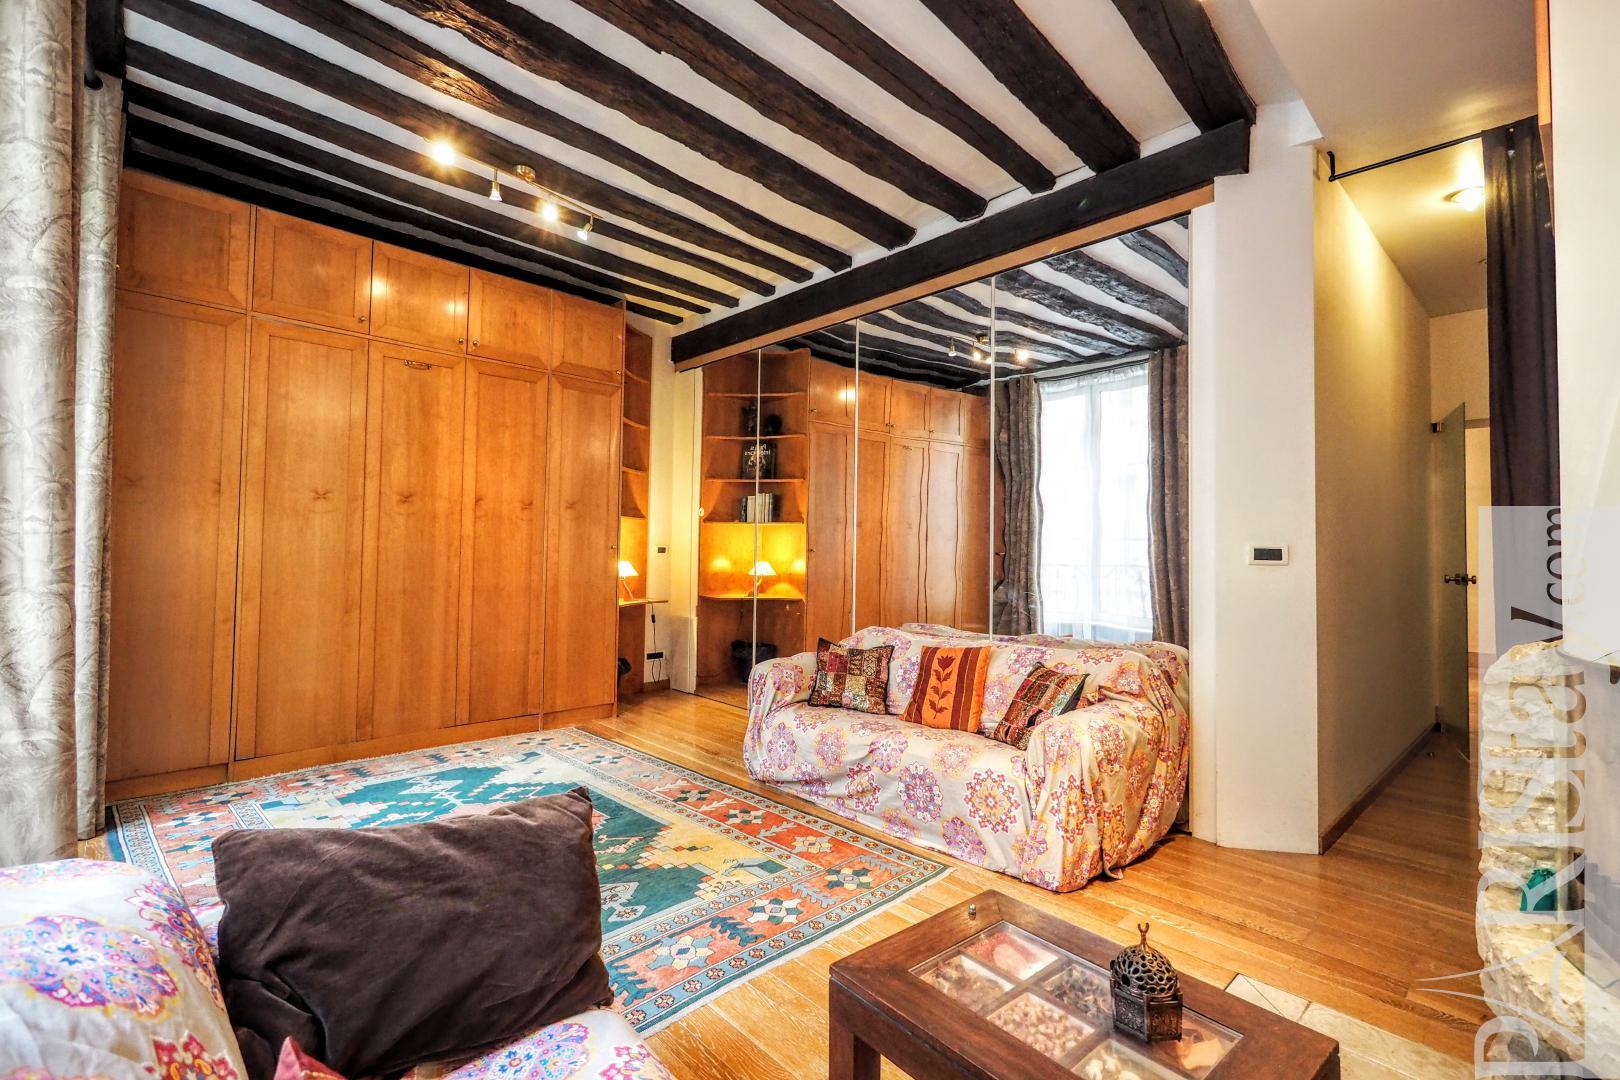 Apartment For Rent Paris Notre Dame Furnished 2 Bedroom